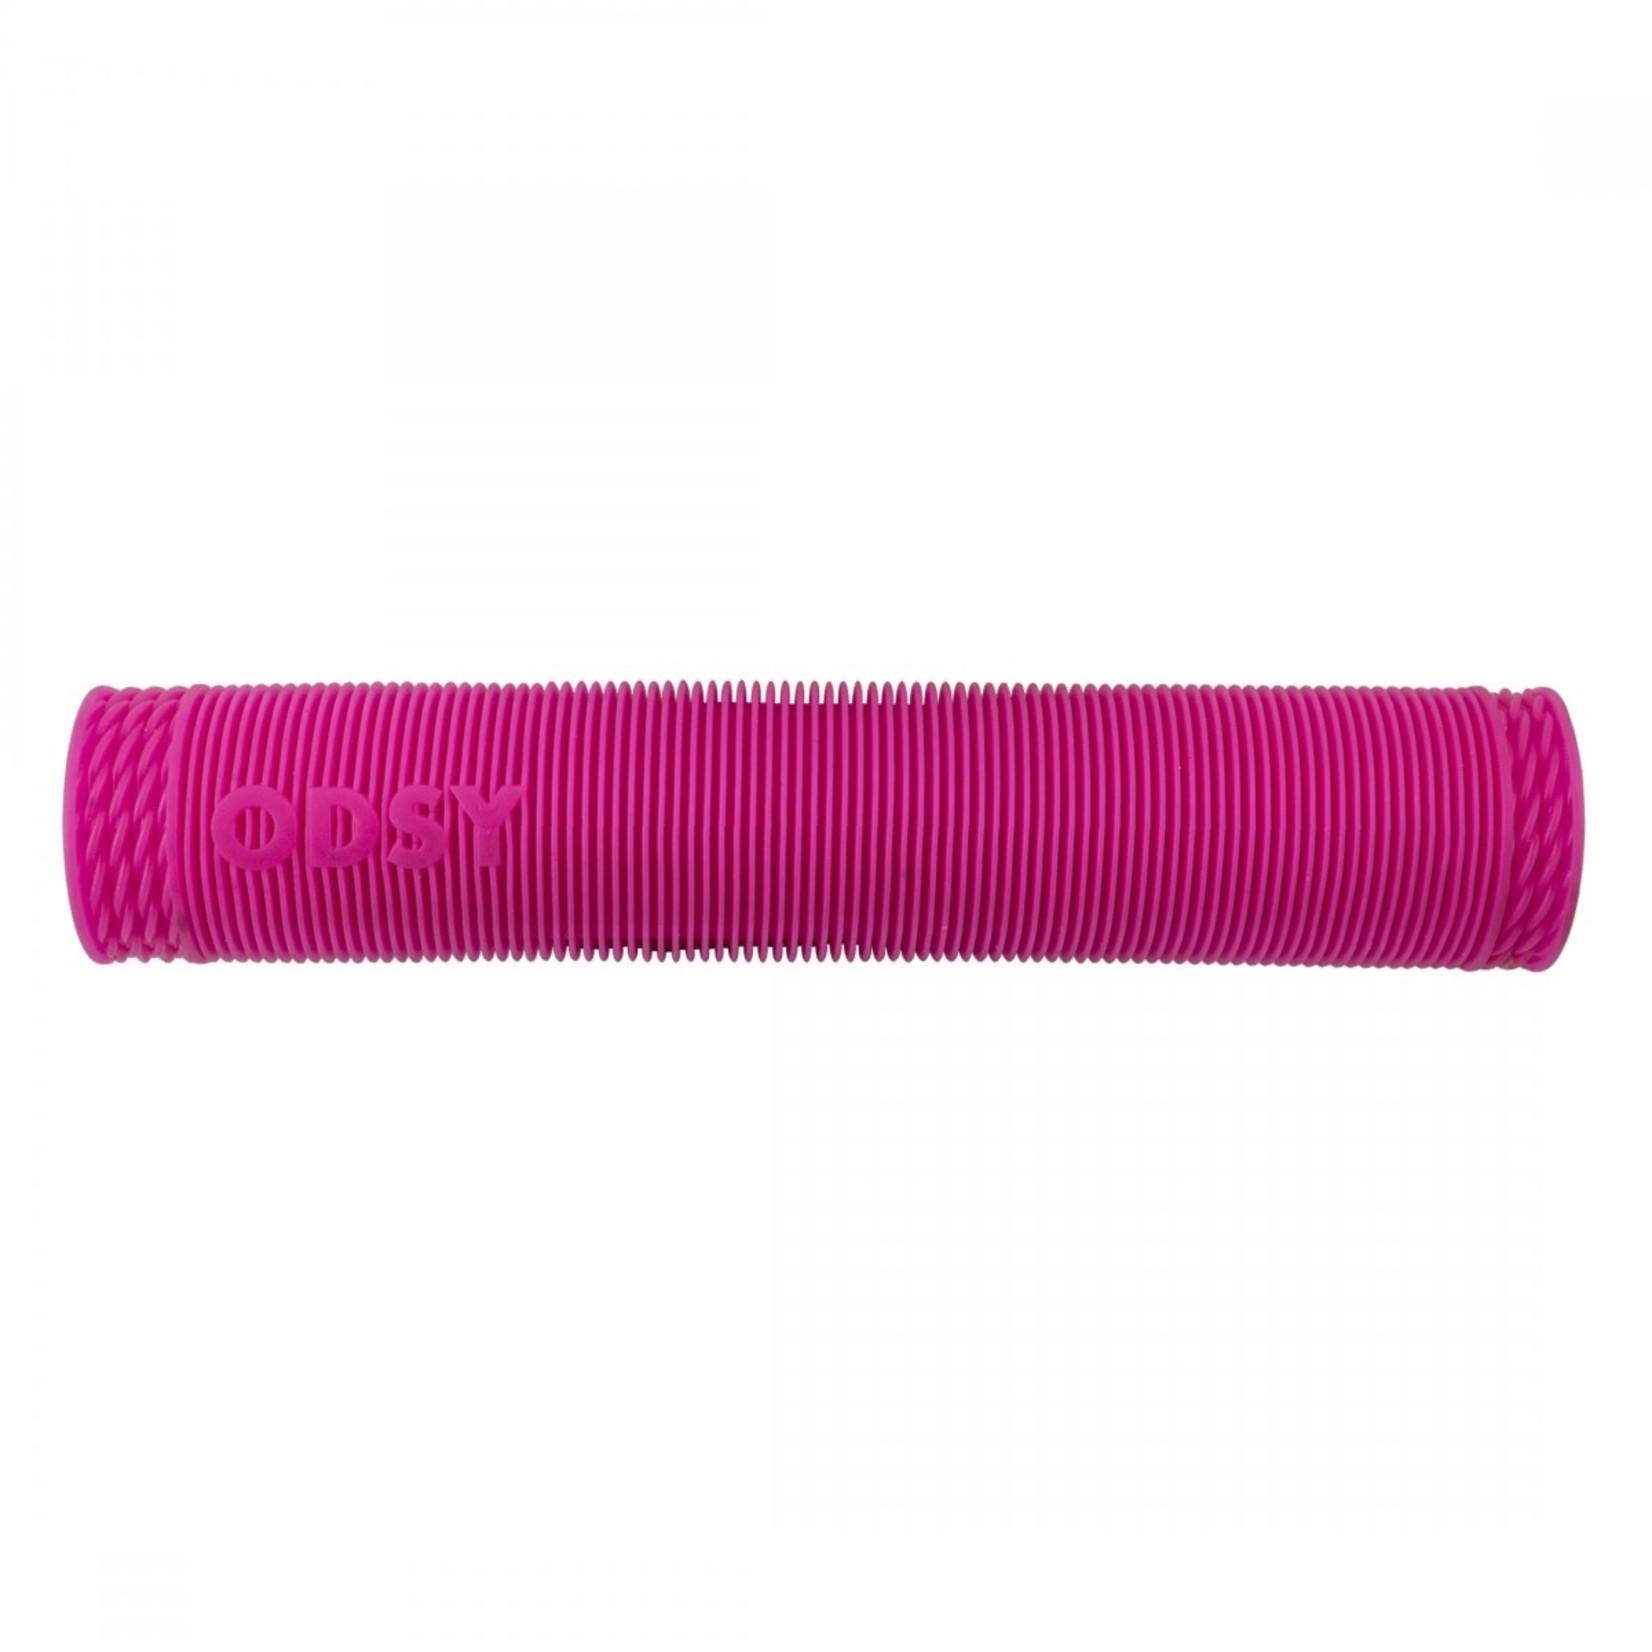 ODYSSEY BROC Grip 160mm Pink